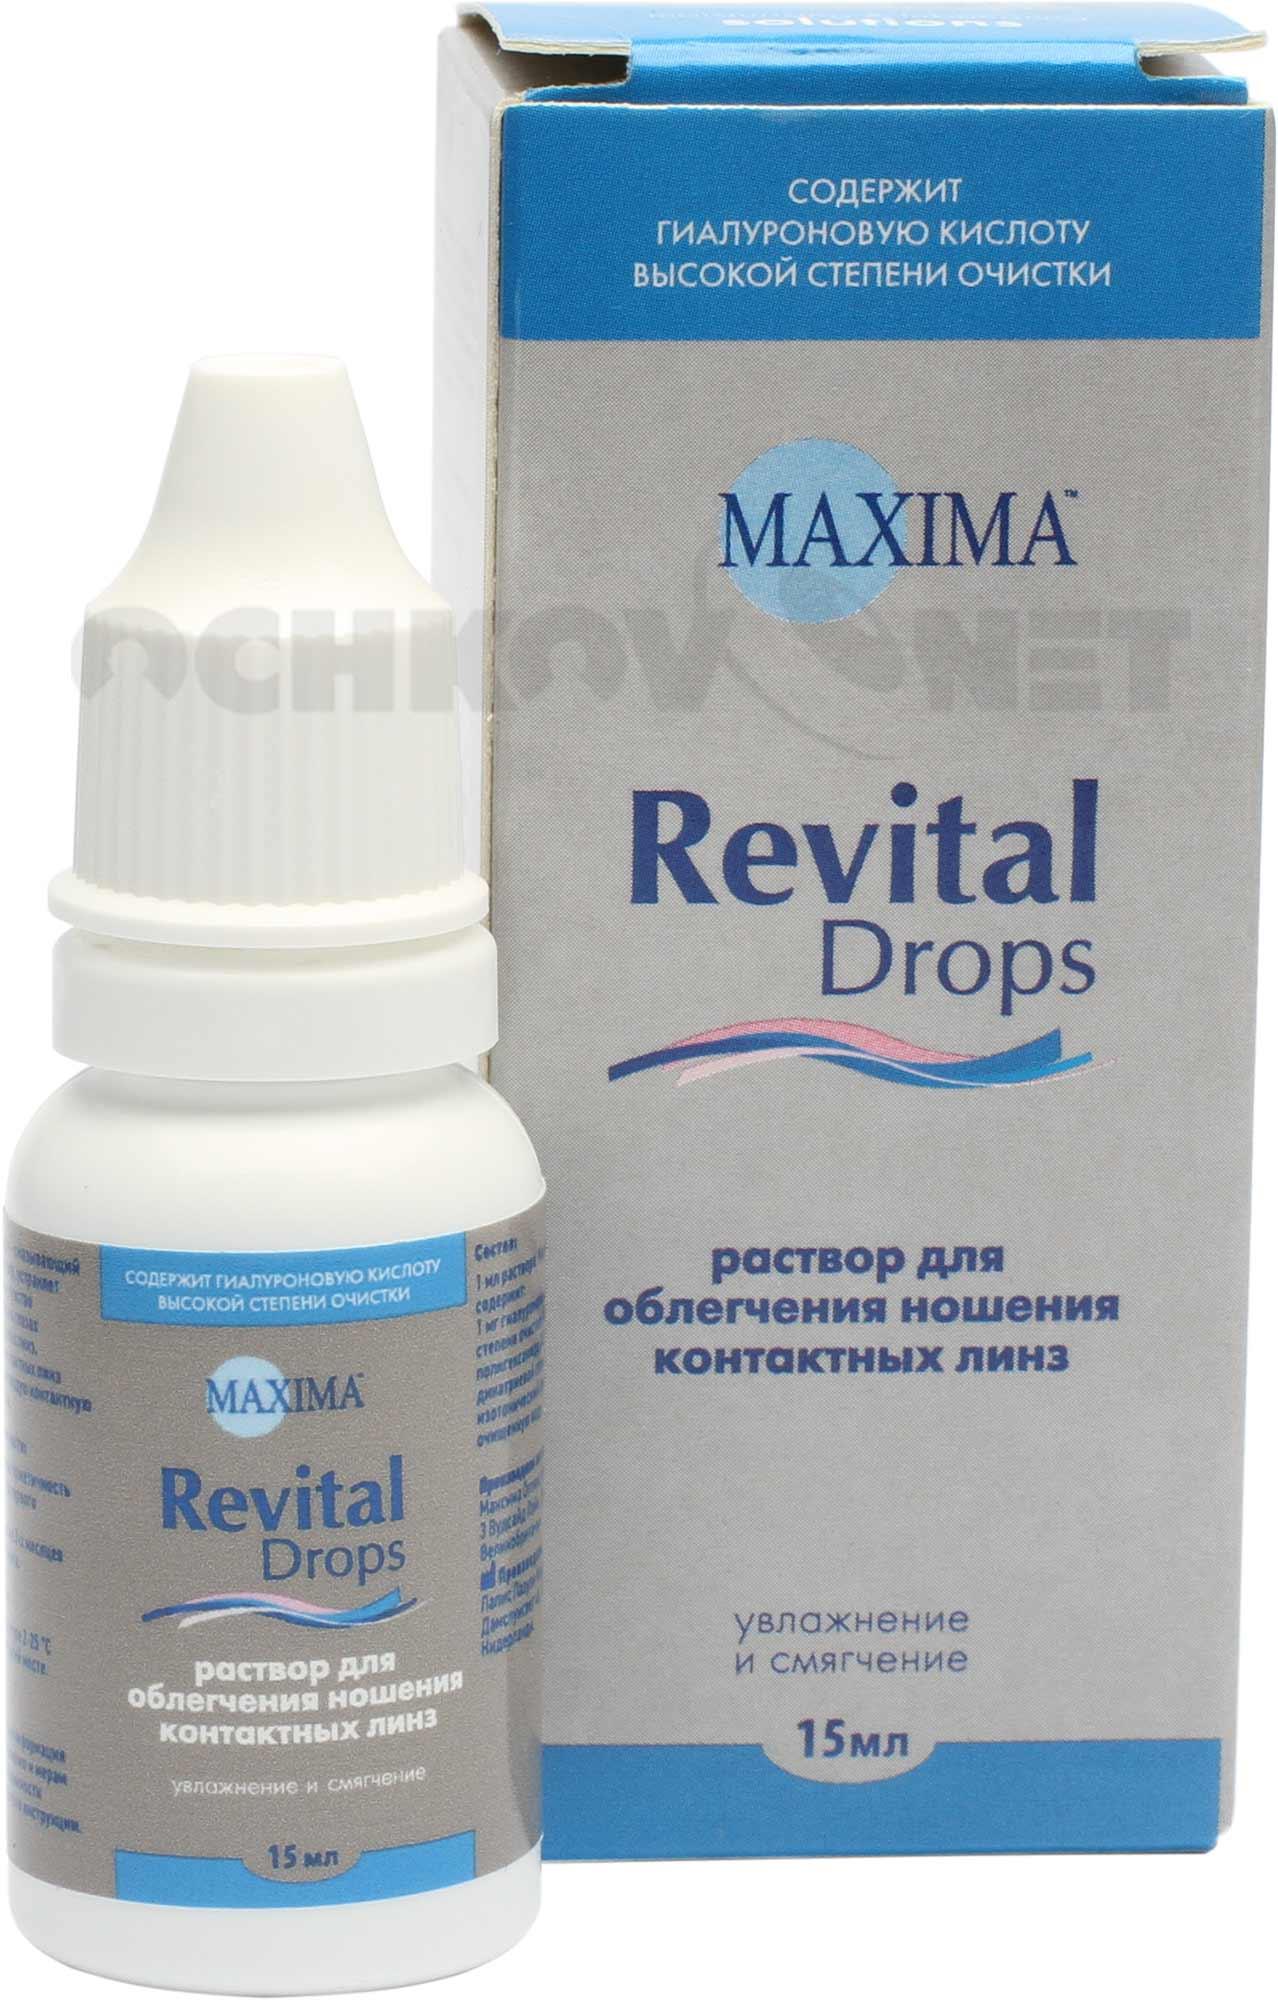 Капли MAXIMA Revital Drops 15 мл